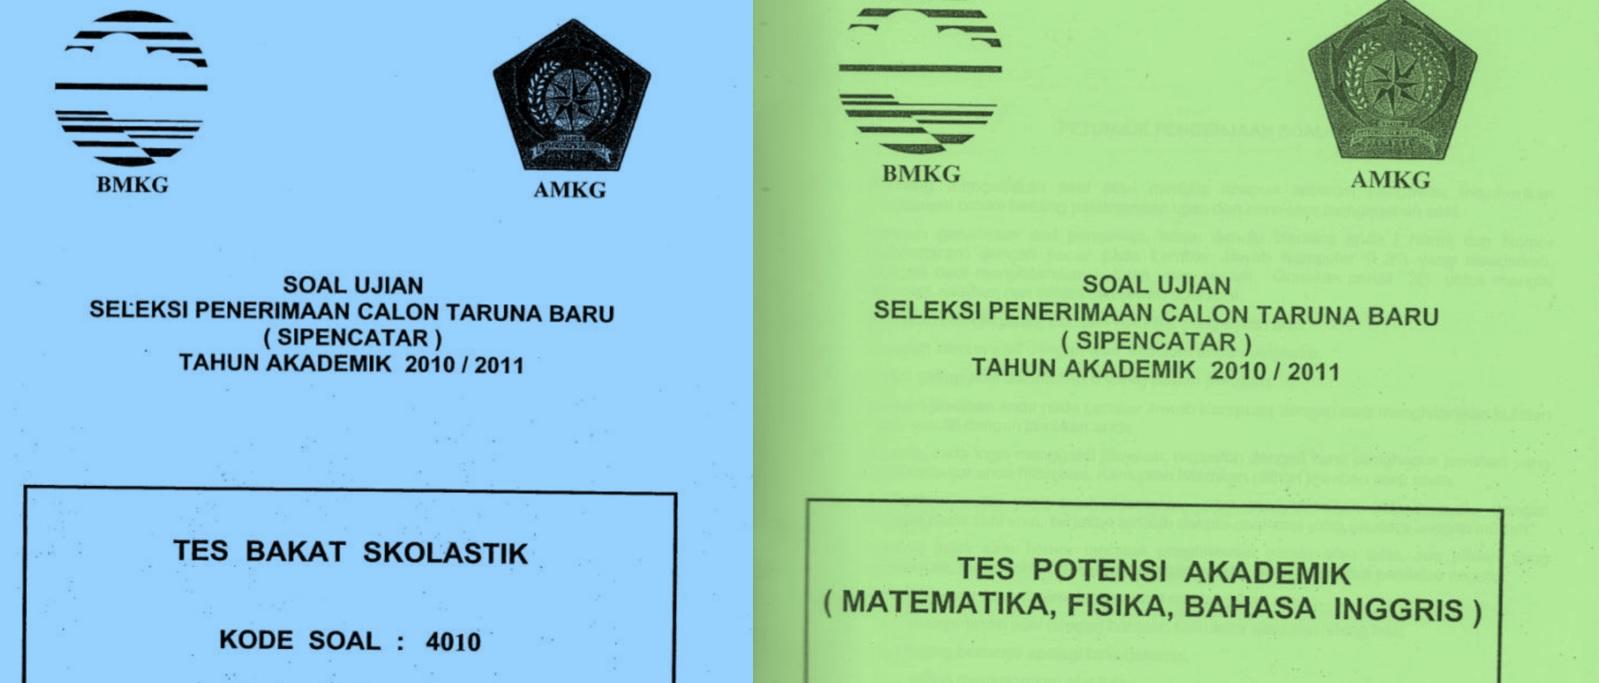 Kumpulan Soal Seleksi Penerimaan Calon Taruna Baru (SIPENCATAR) Sekolah Tinggi Metereologi Klimatologi dan Geofisika (STMKG)